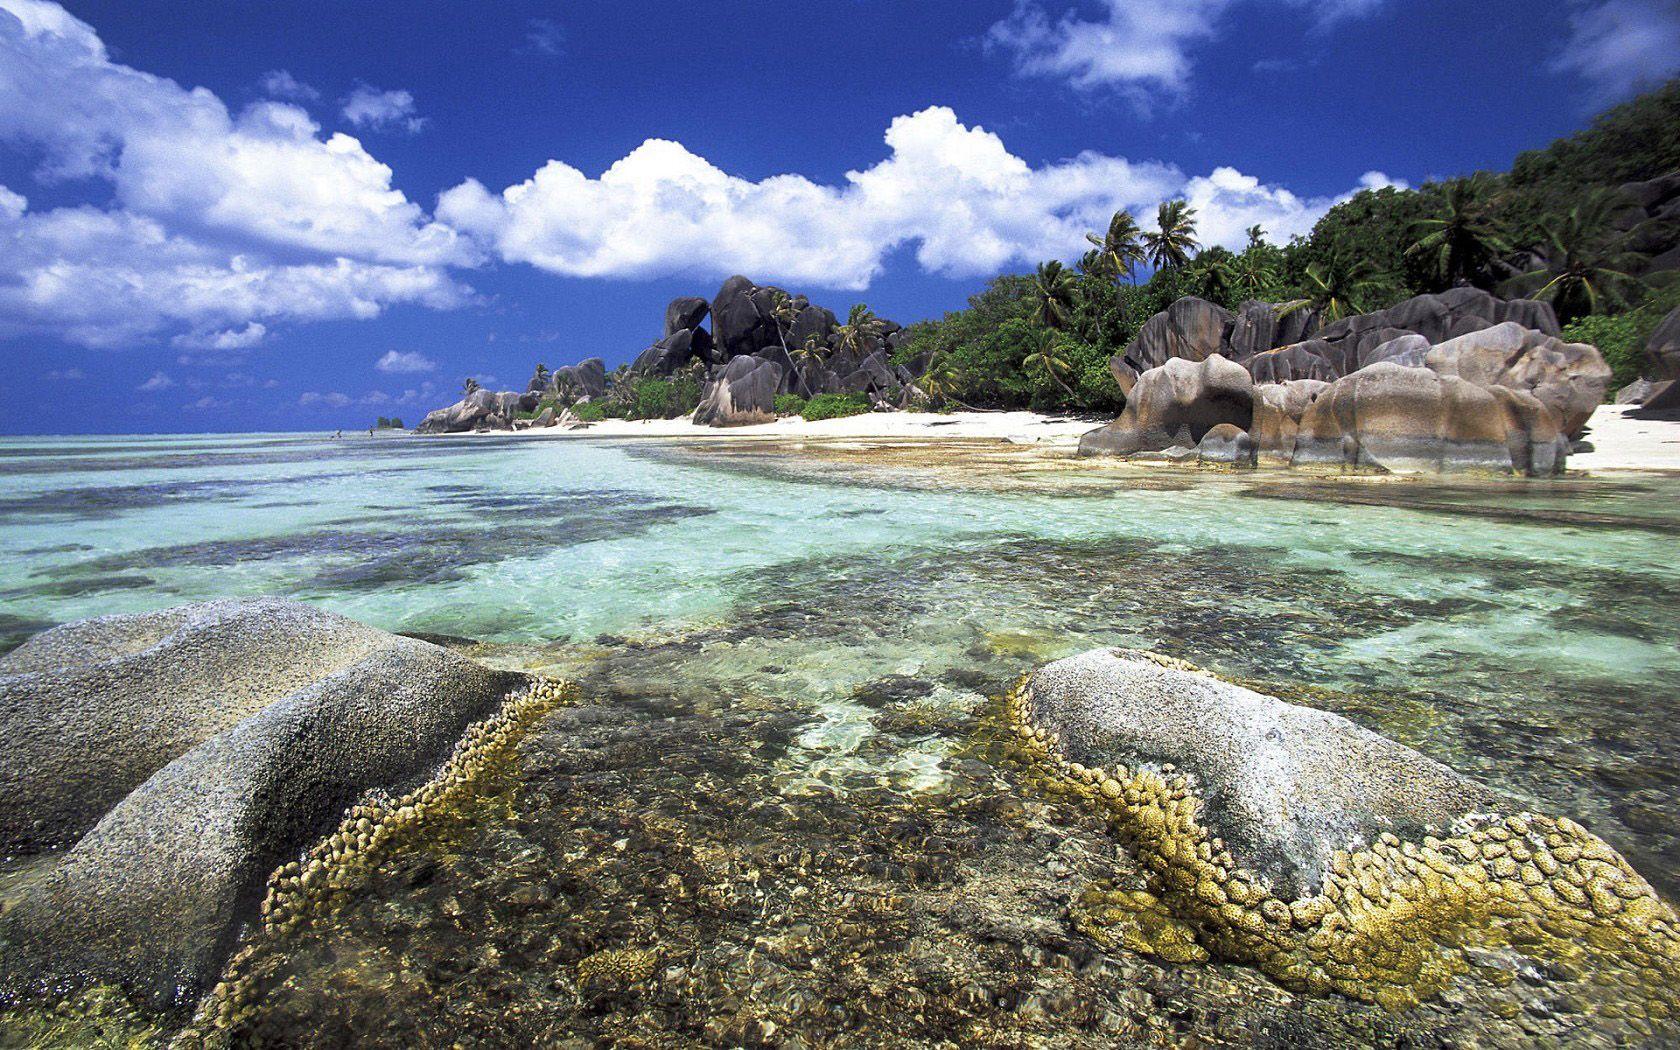 Galapagos Islands Hd Wallpapers Beach Wallpaper Coastal